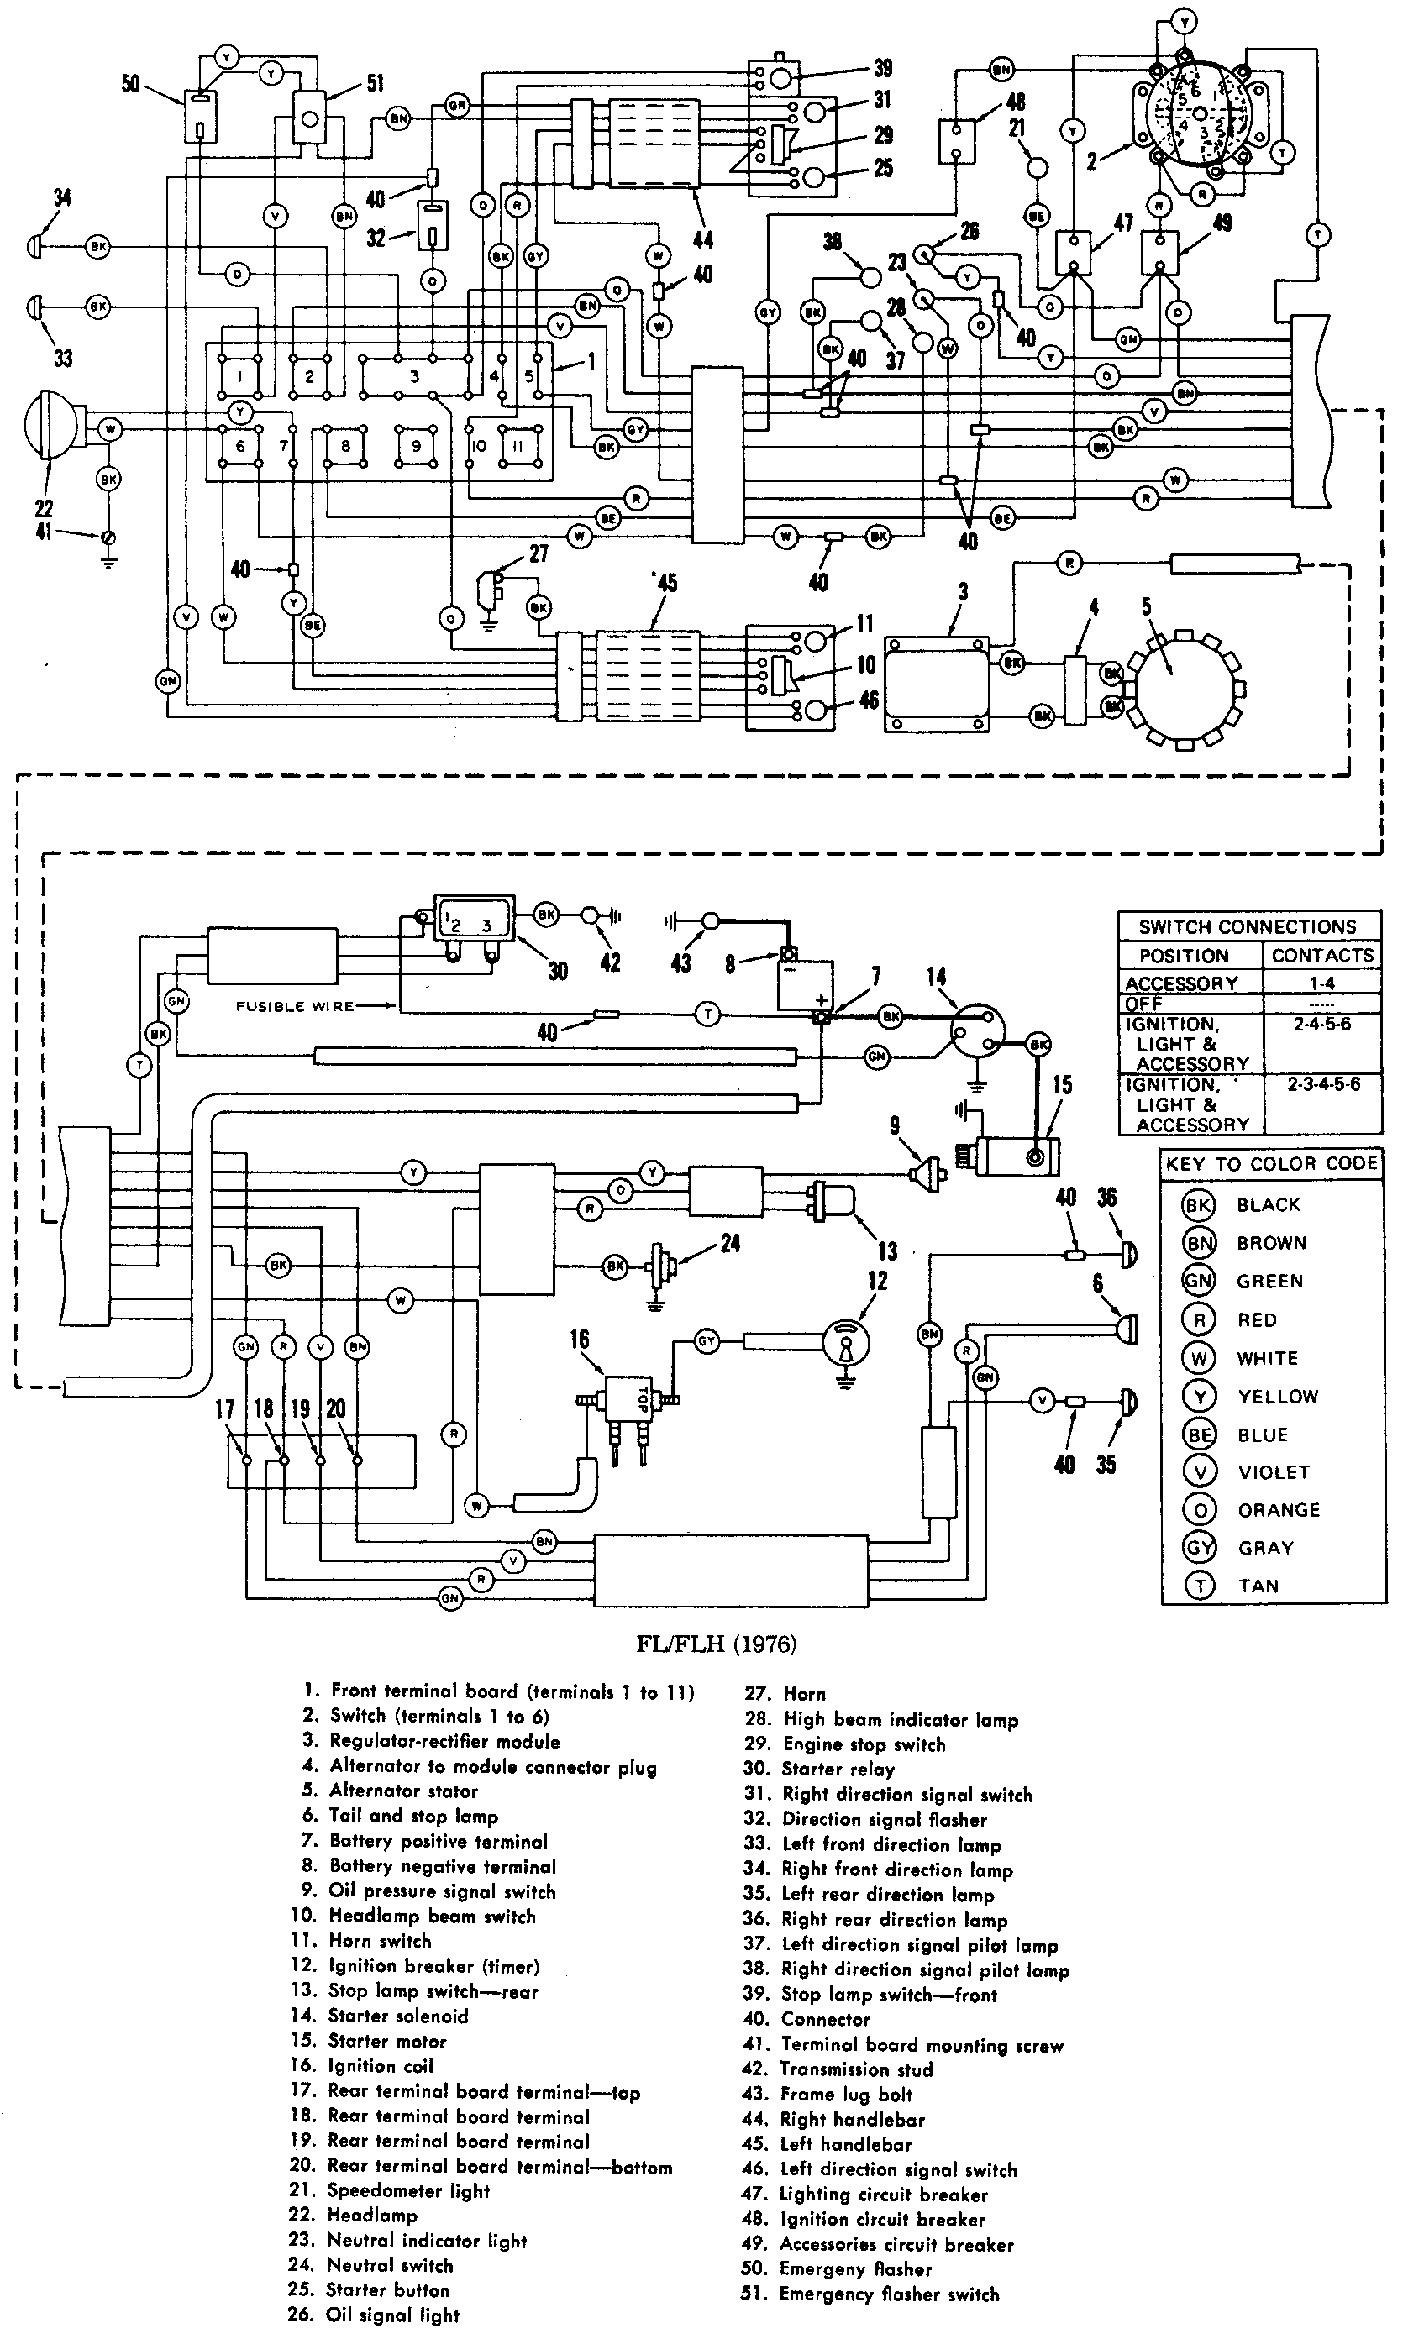 Harley Handlebar Wiring Harness Diagram | Wiring Diagram - Harley Handlebar Wiring Diagram